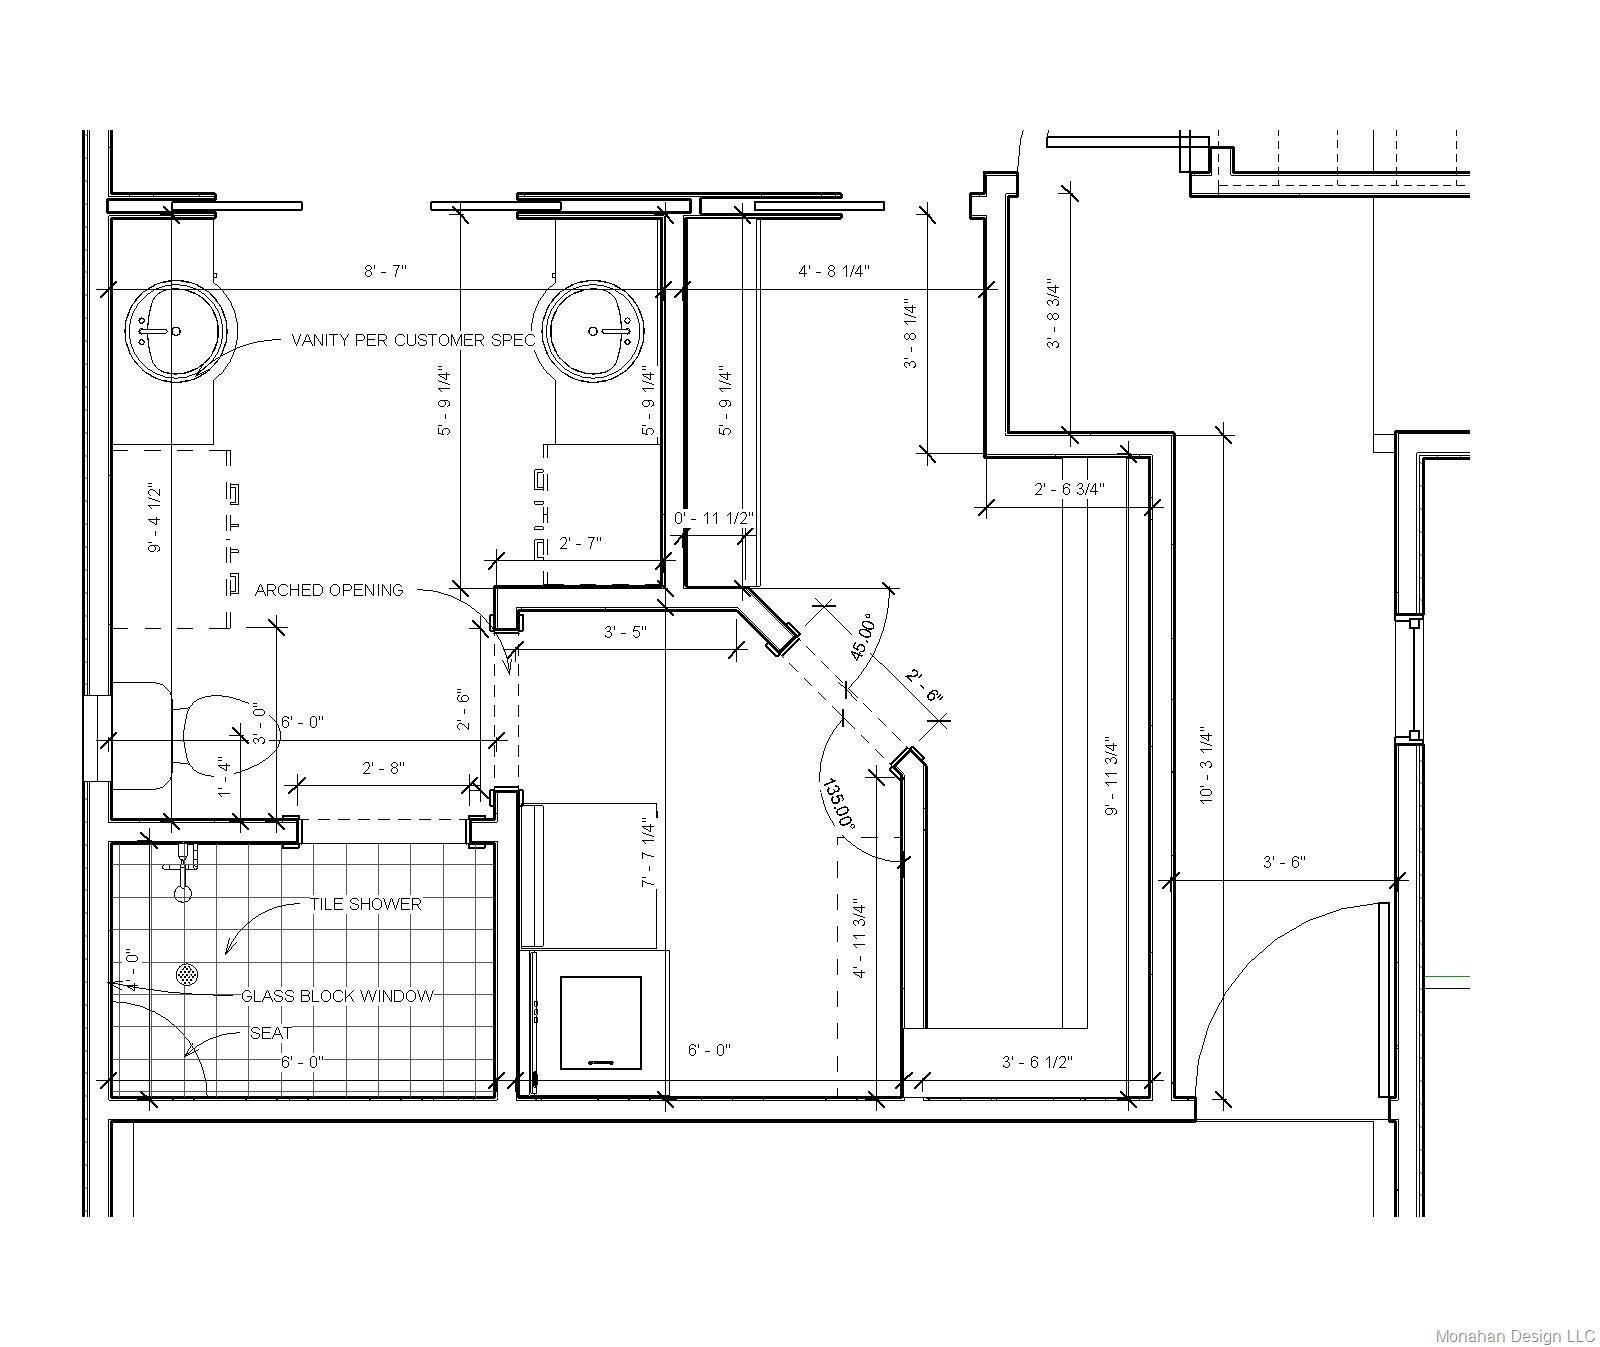 Master Bathroom Layout Plans  Hunsinger Addition major renovation Lake Leann – Monahan